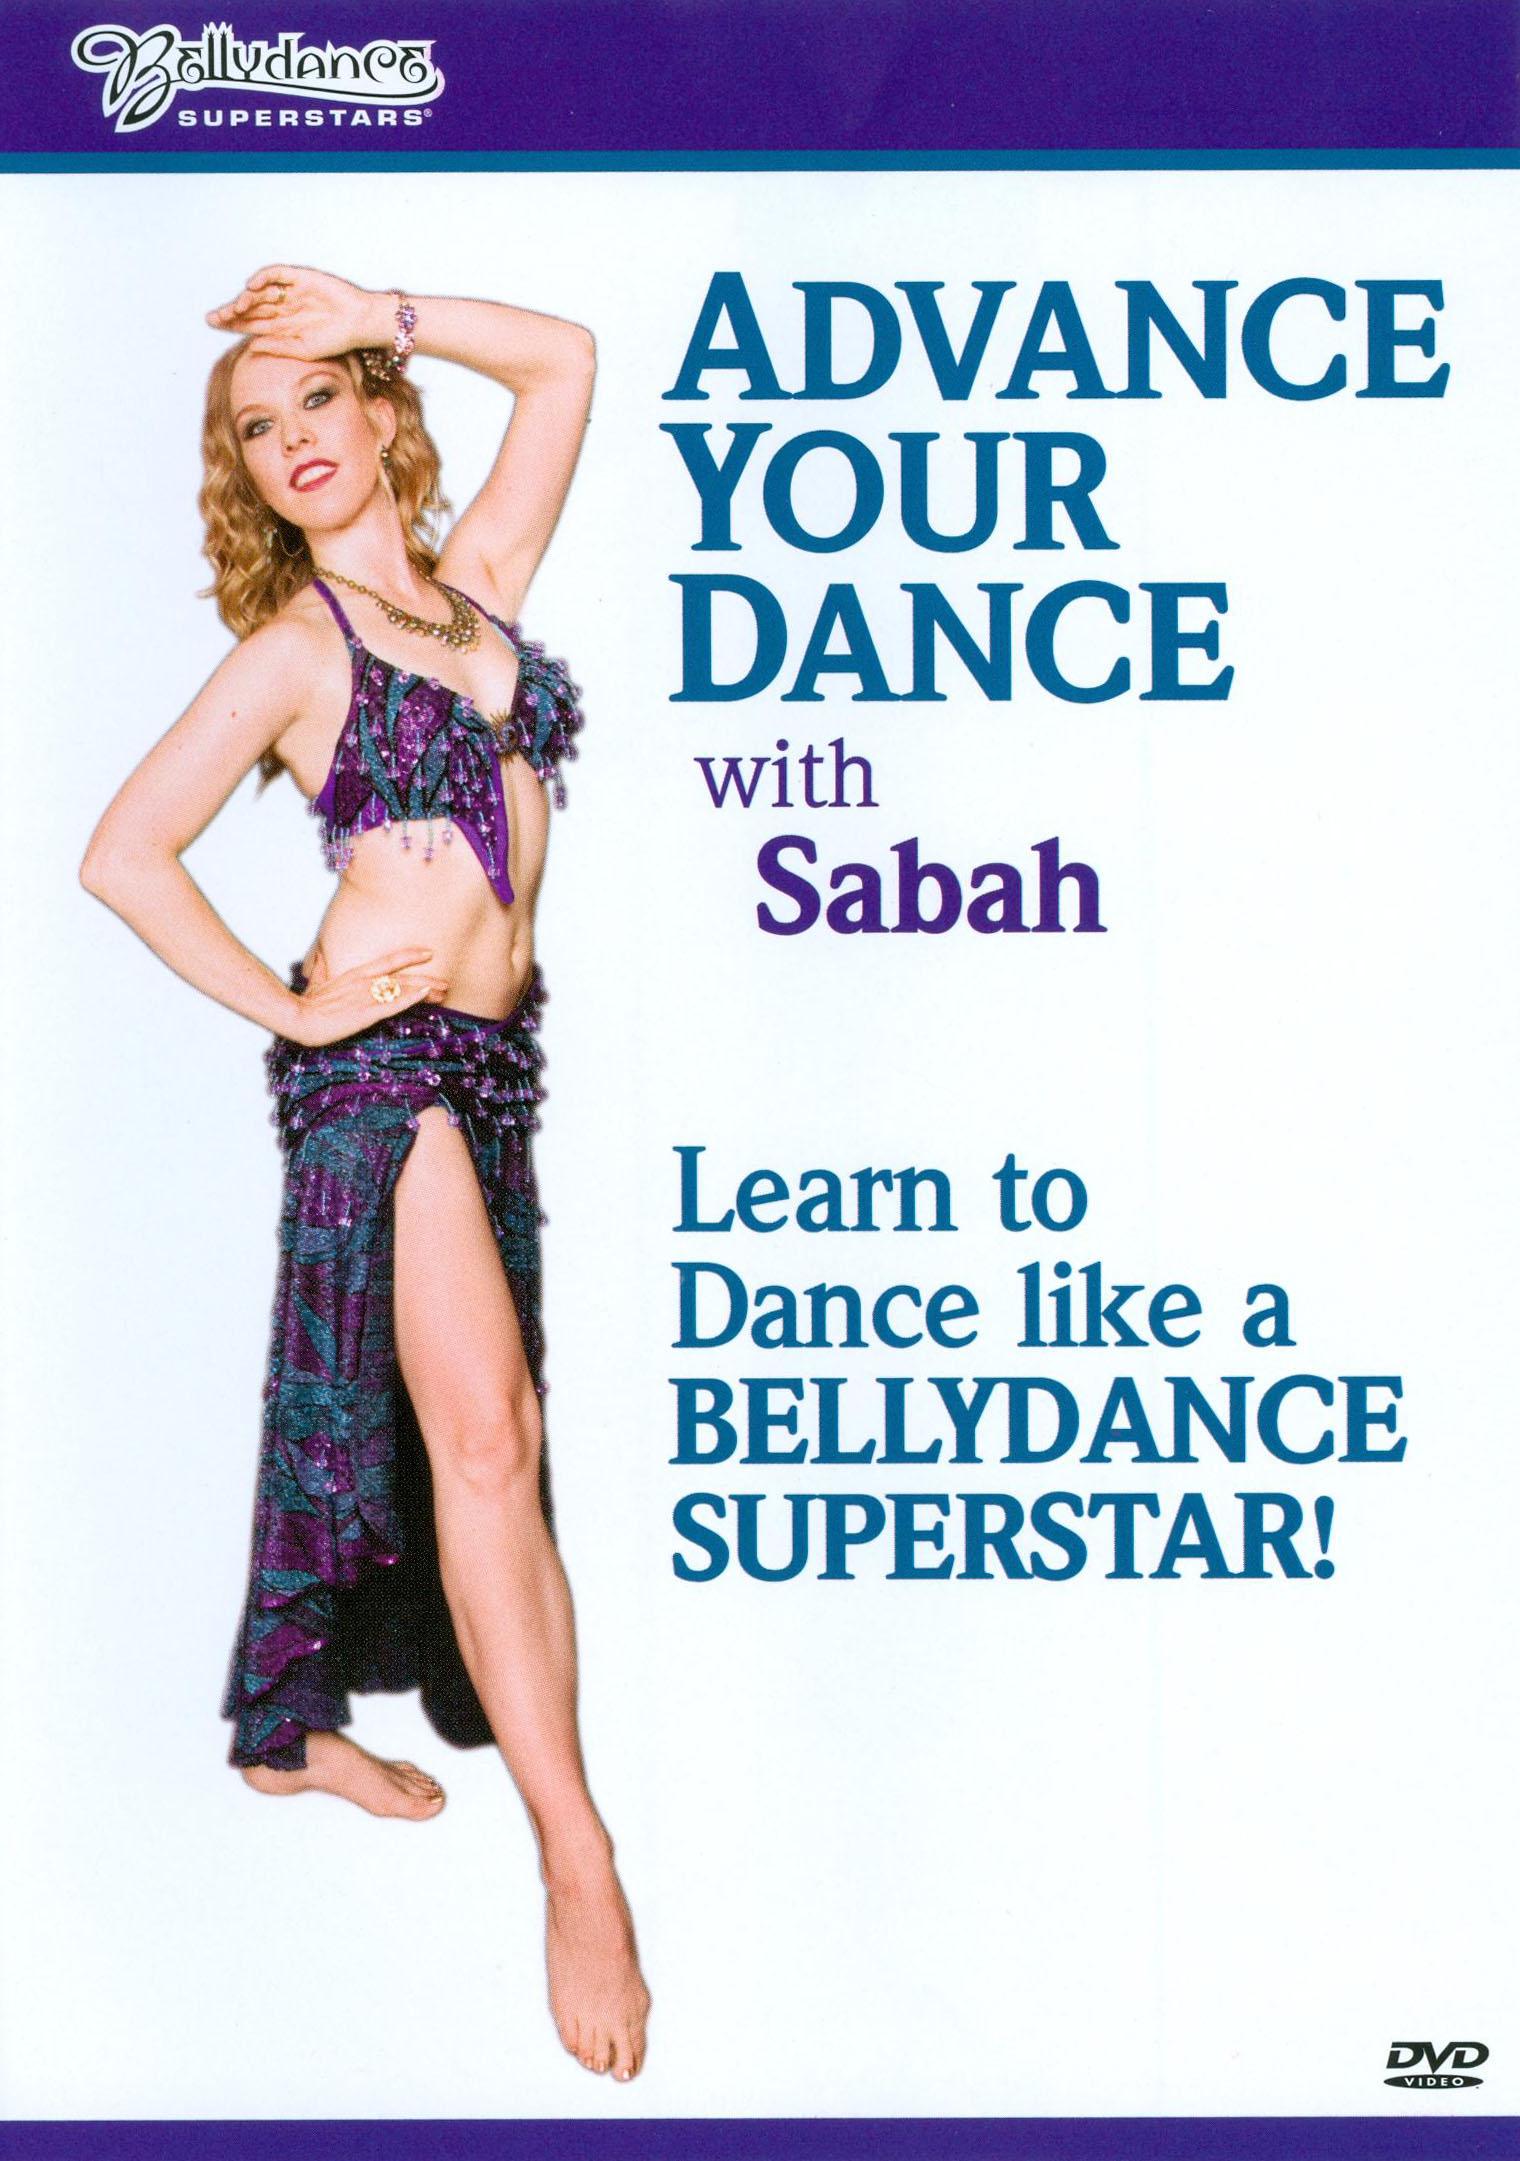 Bellydance Superstars: Advance Your Dance with Sabah